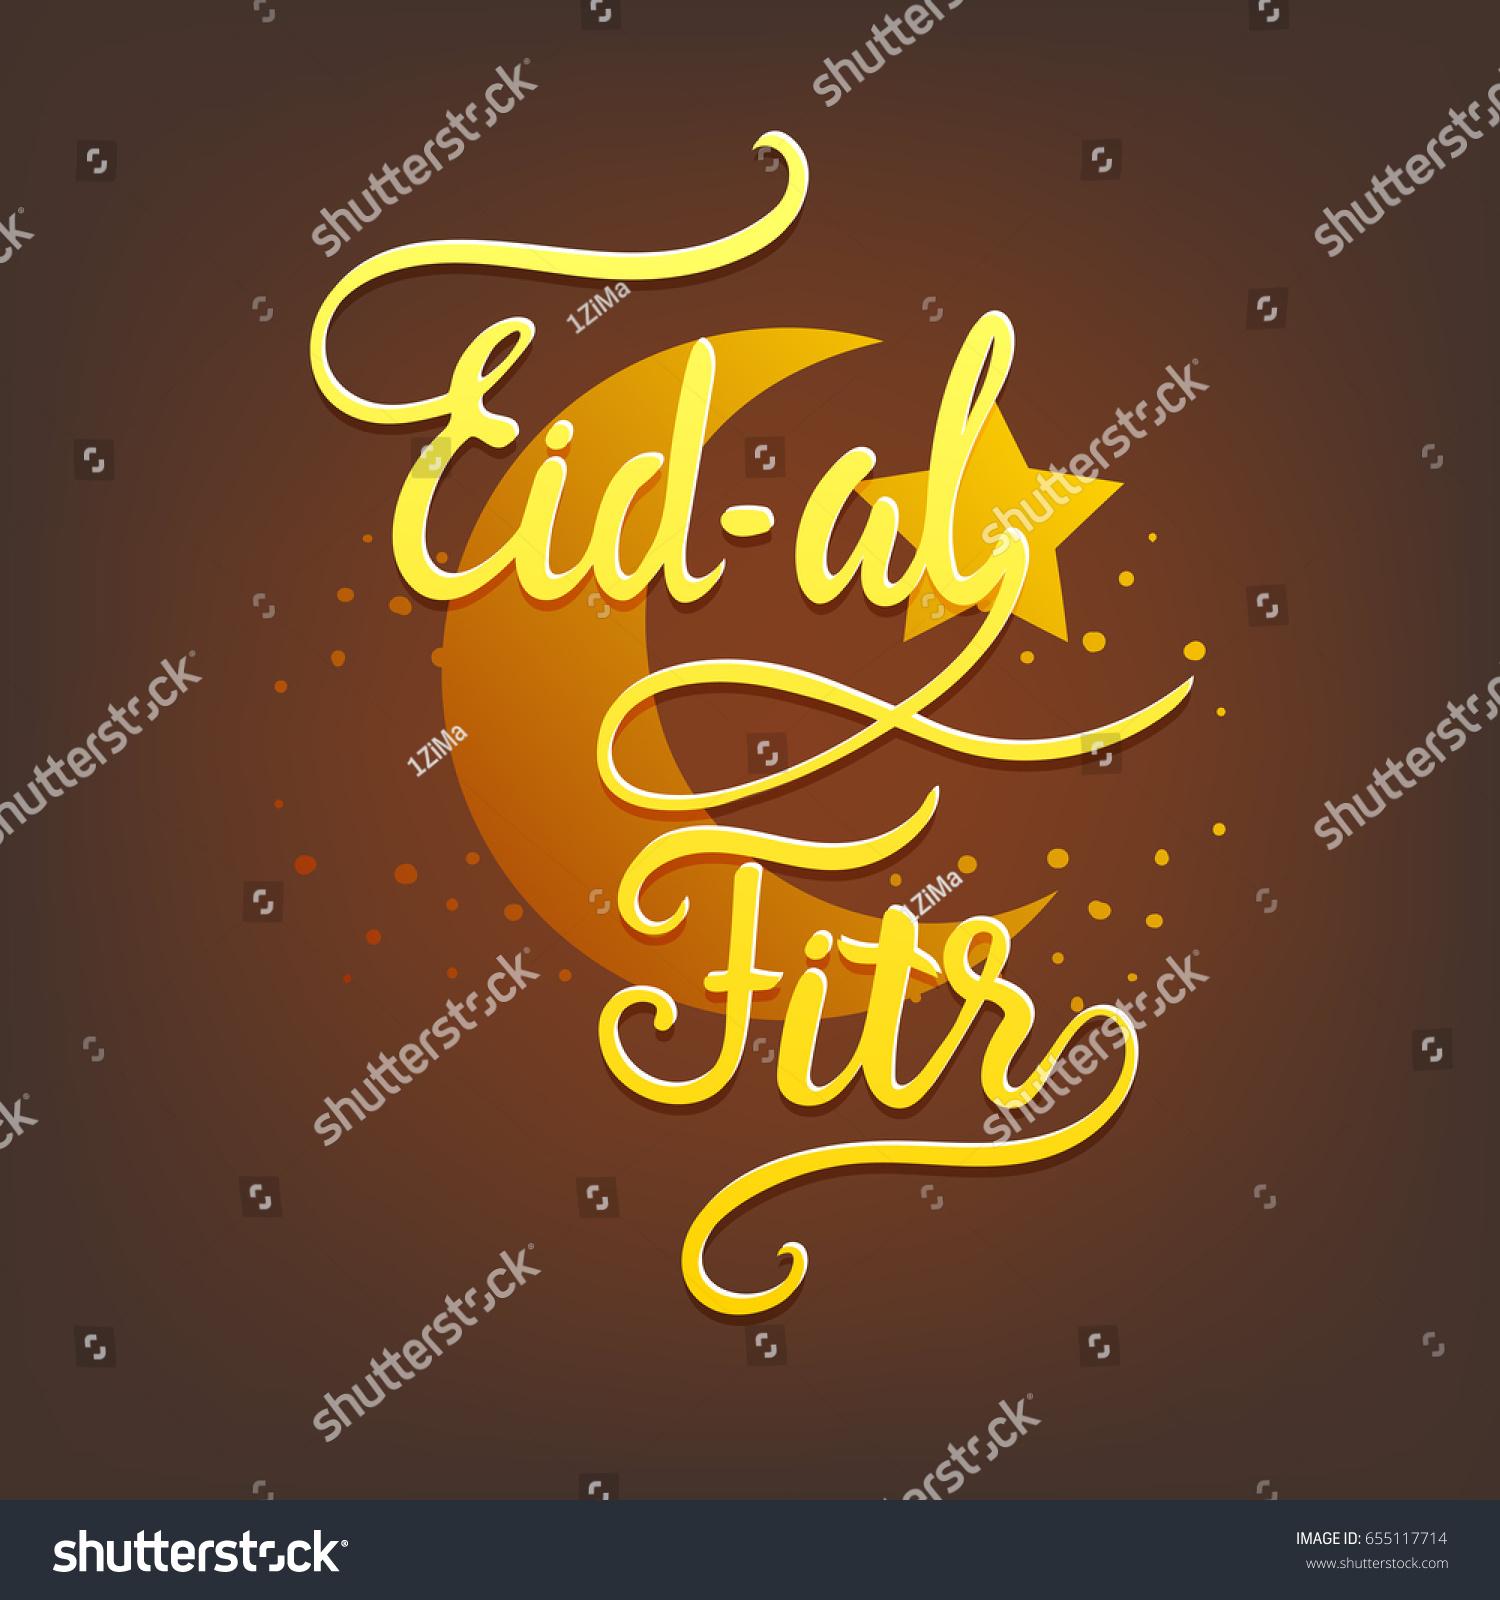 Cool Idd Eid Al-Fitr Greeting - stock-vector-eid-al-fitr-lettering-eid-mubarak-greeting-card-hand-drawn-vector-illustration-design-elements-655117714  Graphic_861528 .jpg